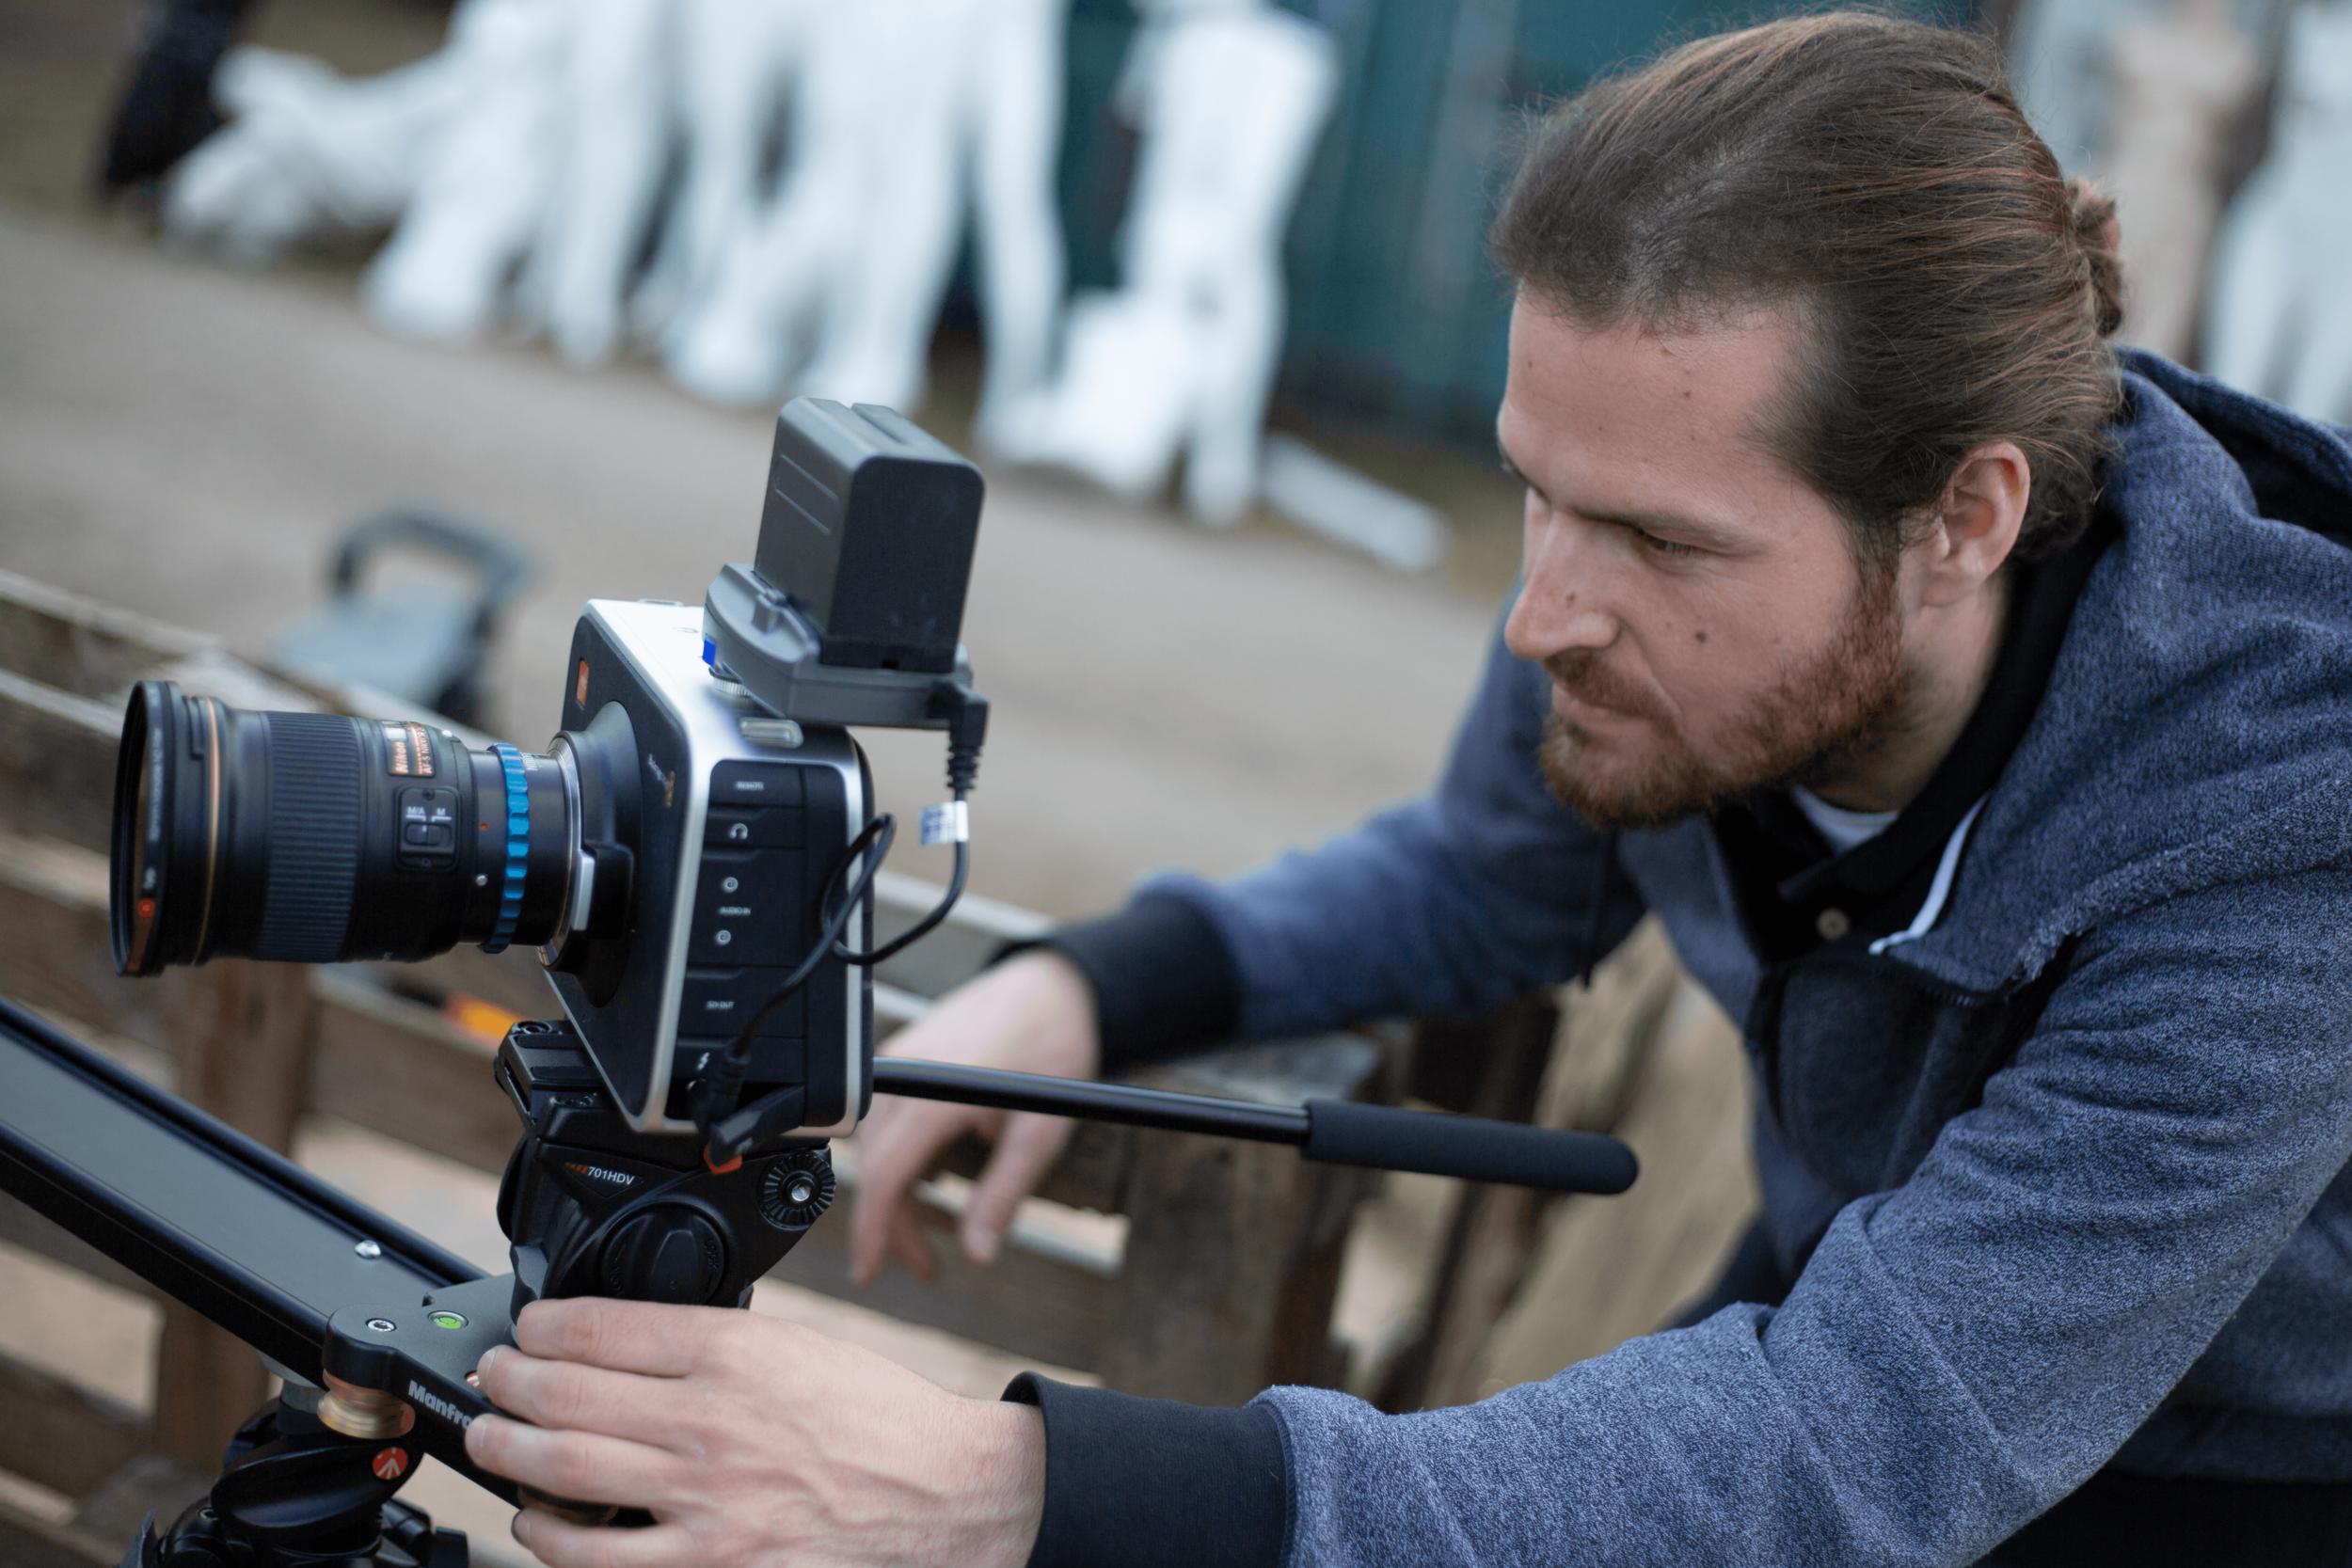 daniel kutcher operating camera.png